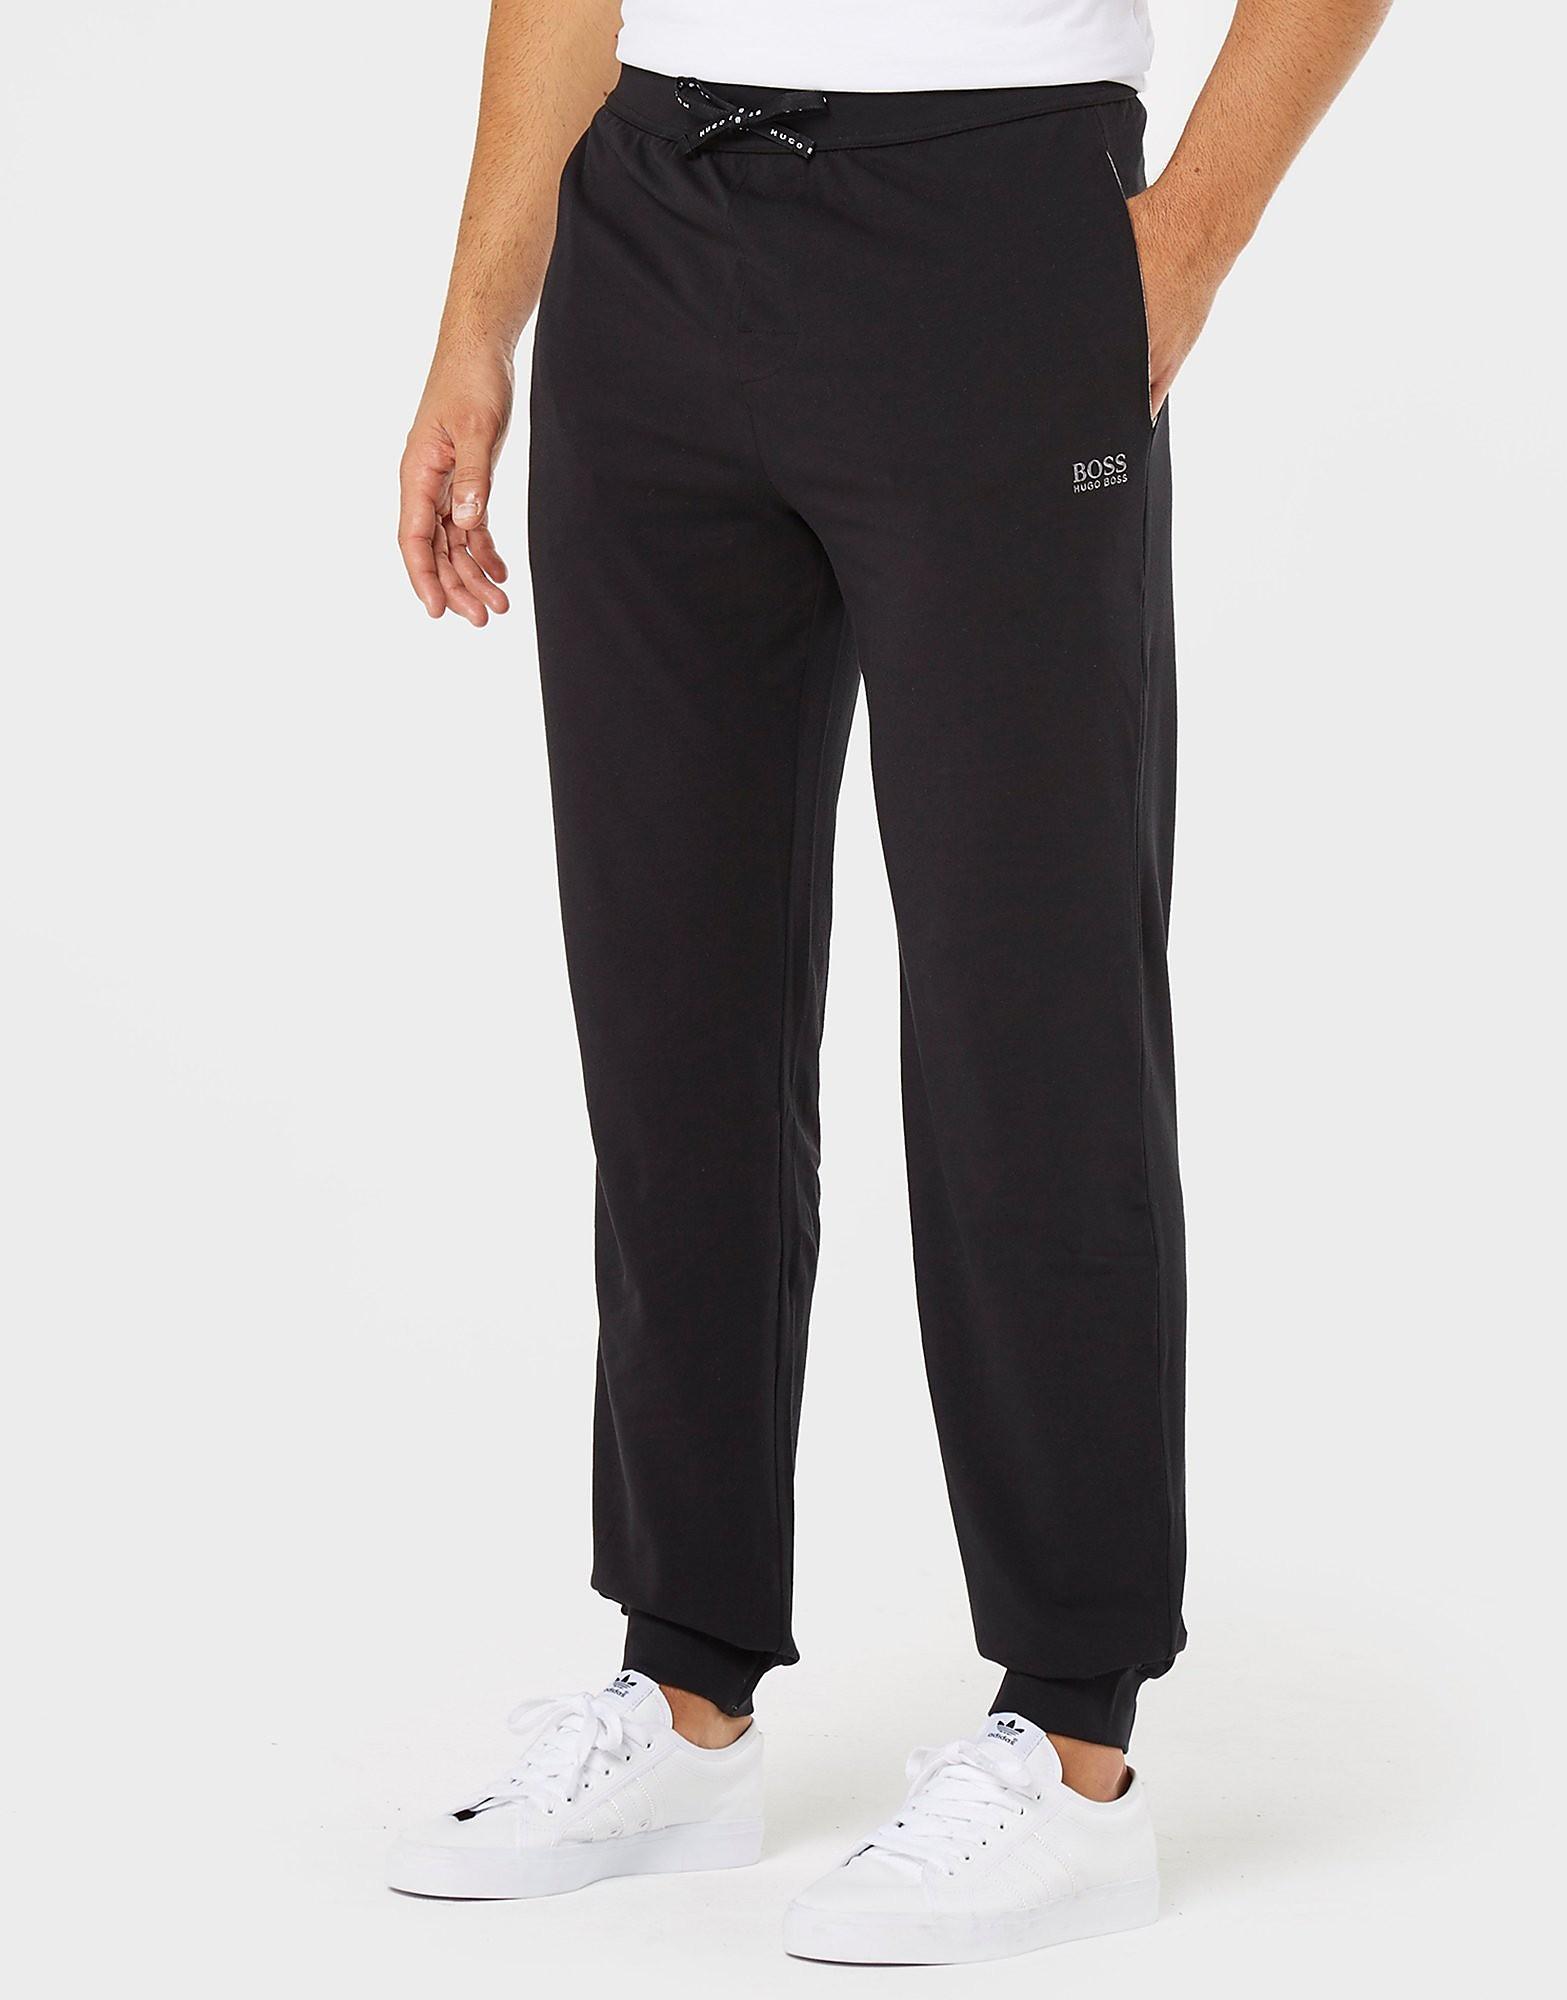 BOSS Cuff Track Pants